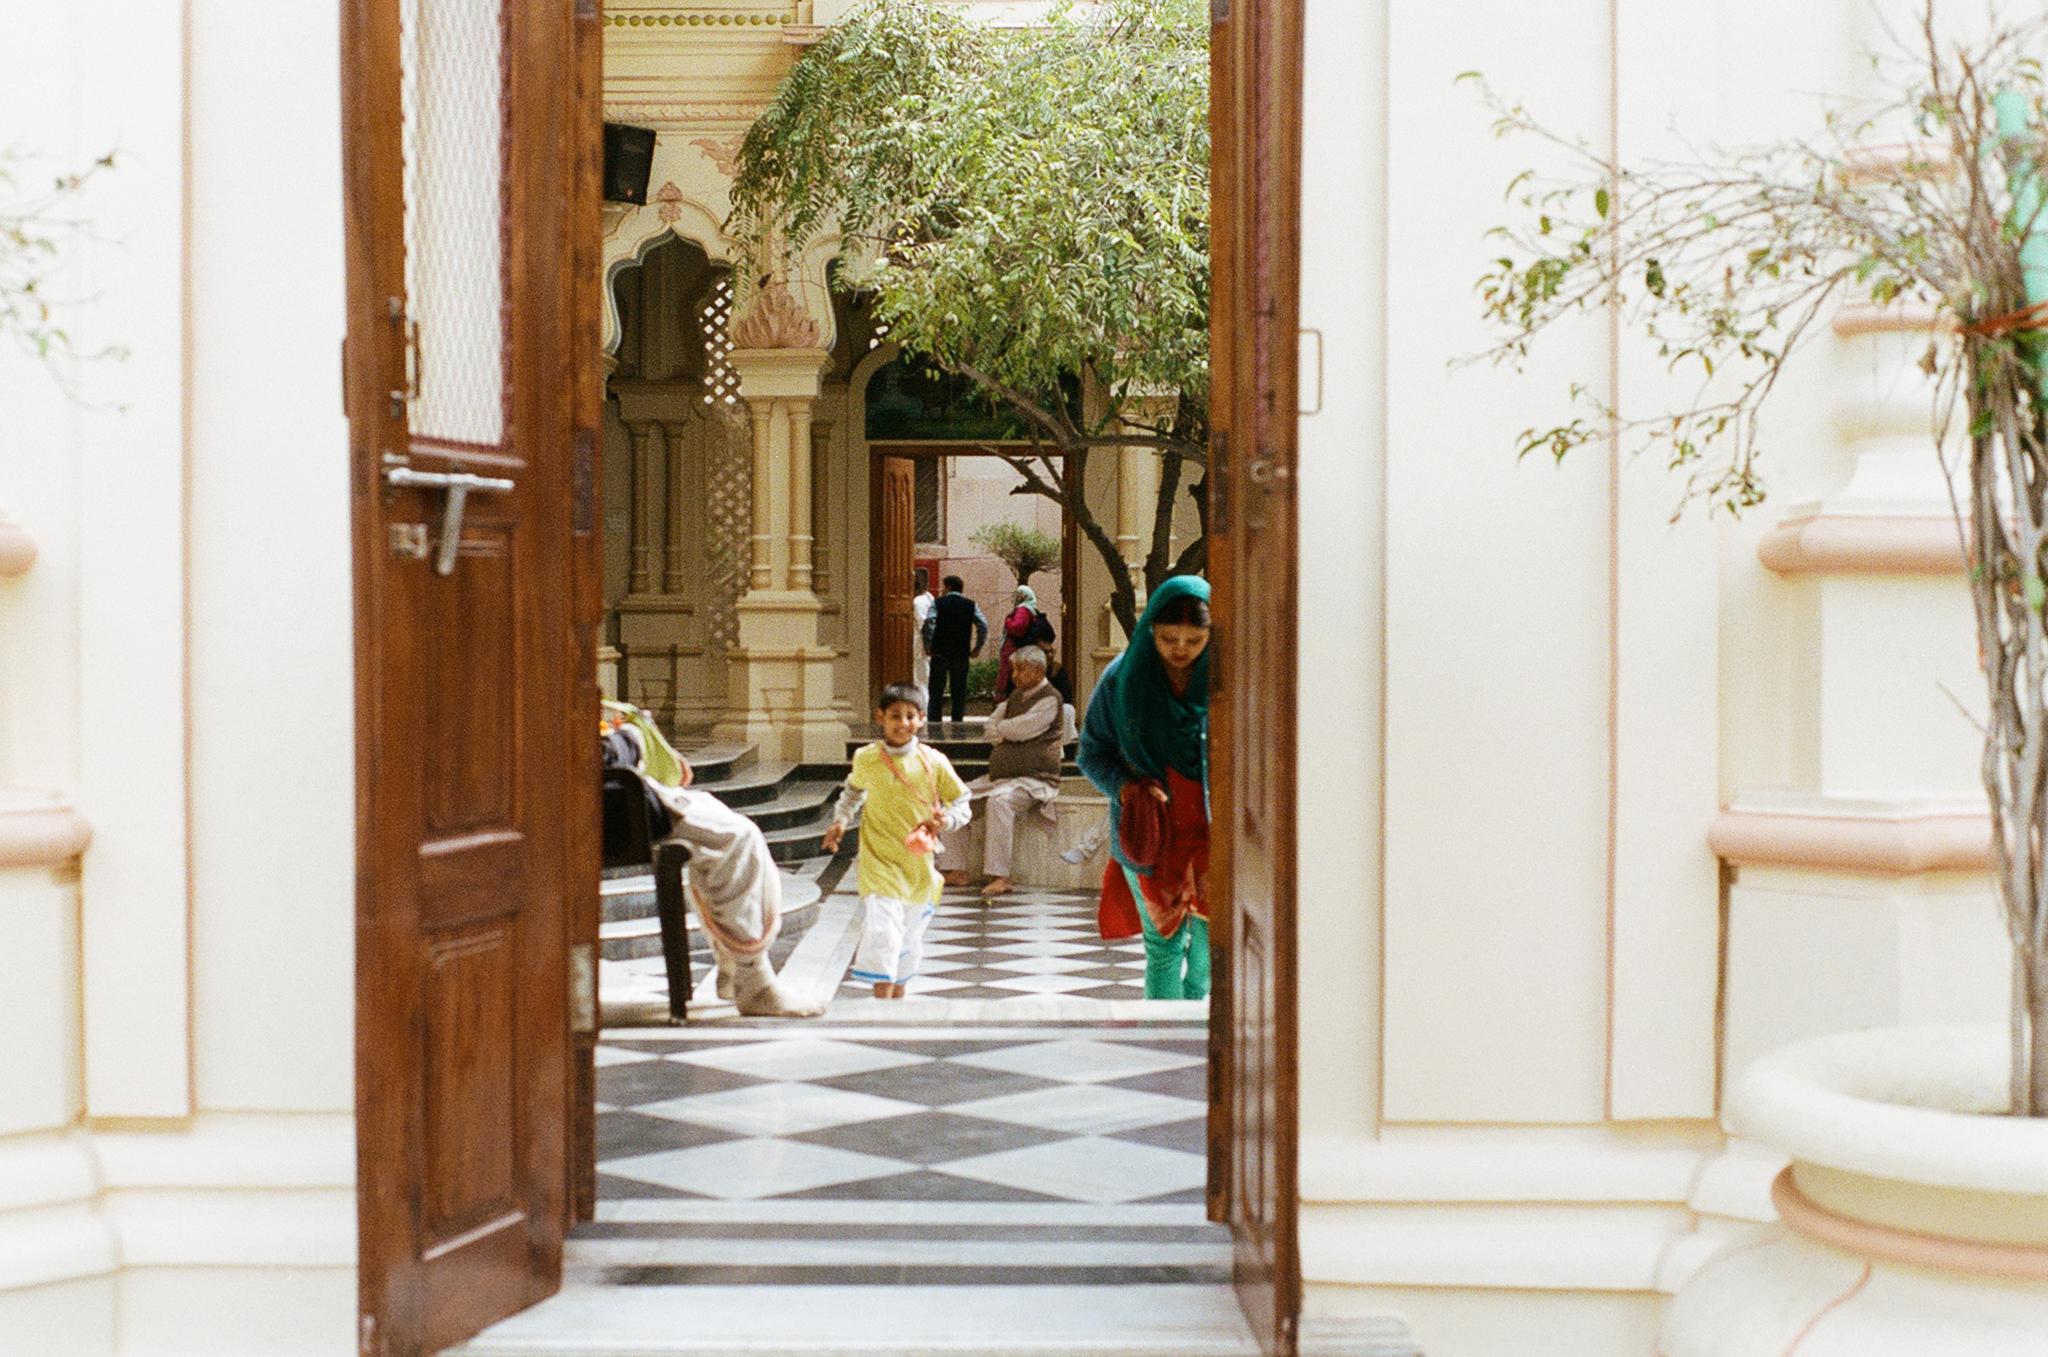 Vrindavan India Travel Street Photography (15 of 27).jpg